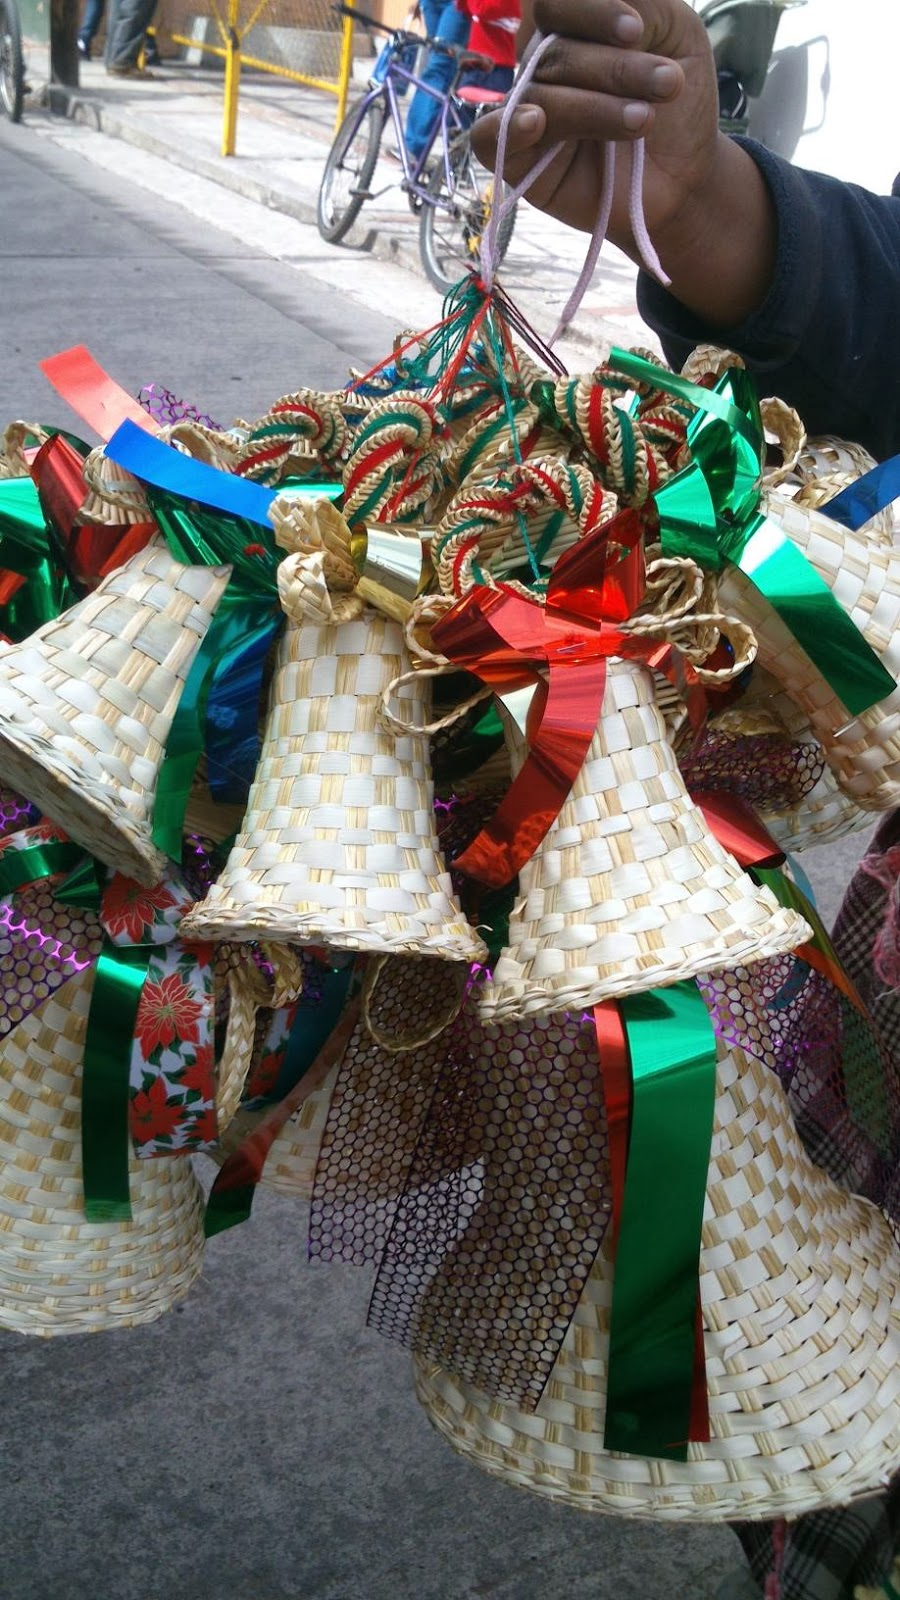 Jaime ramos m ndez artesan as navide as en tanganc cuaro for Artesanias navidenas